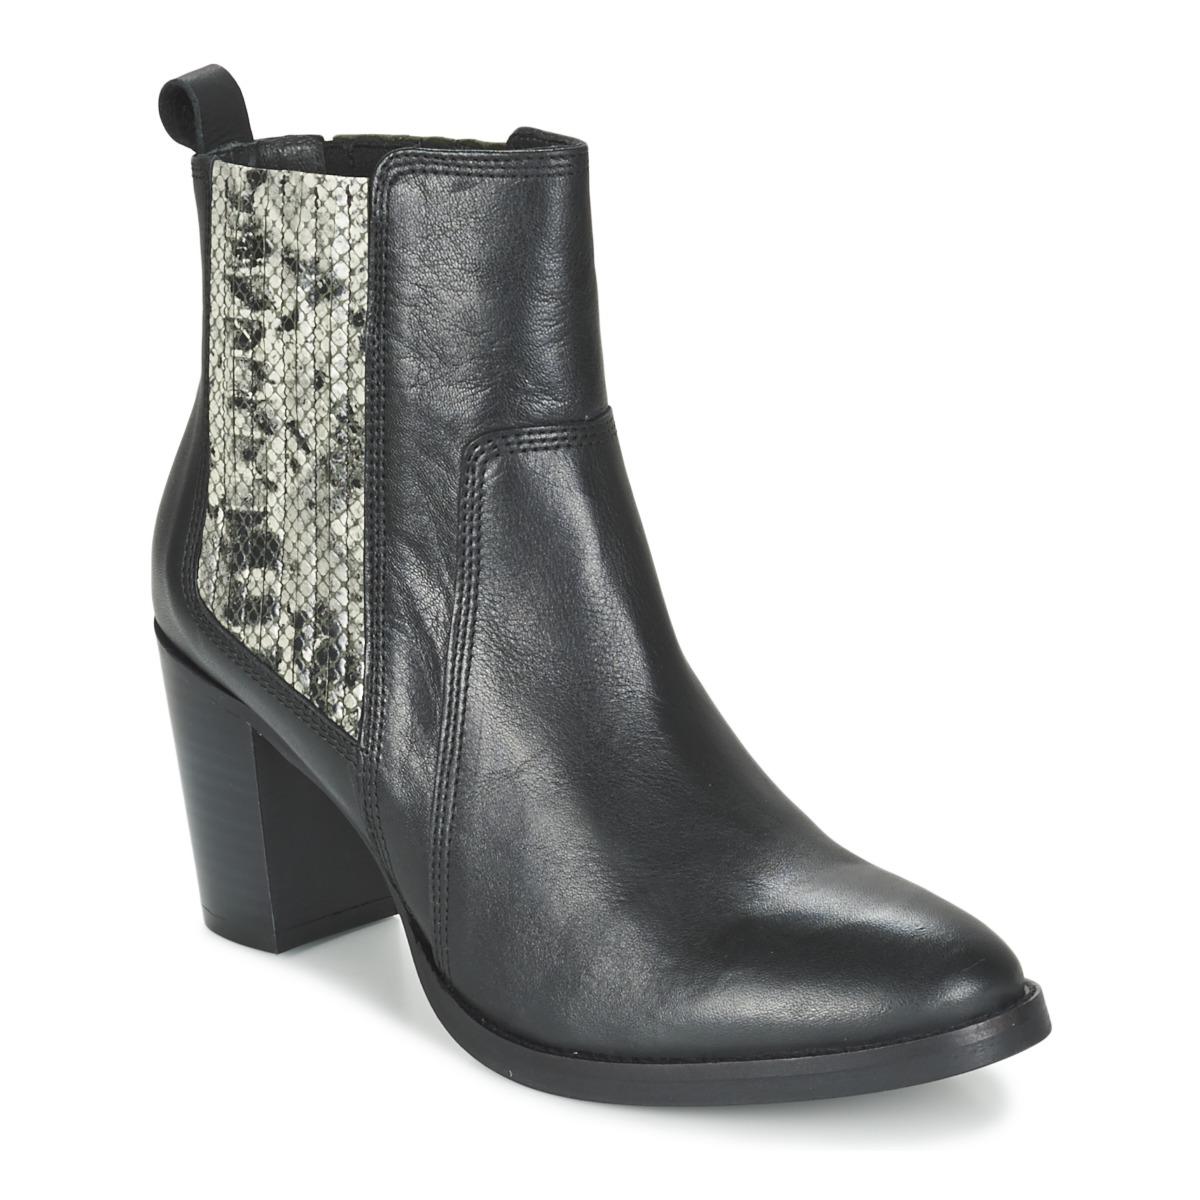 Betty London FLARA Schwarz - Kostenloser Versand bei Spartoode ! - Schuhe Low Boots Damen 59,50 €